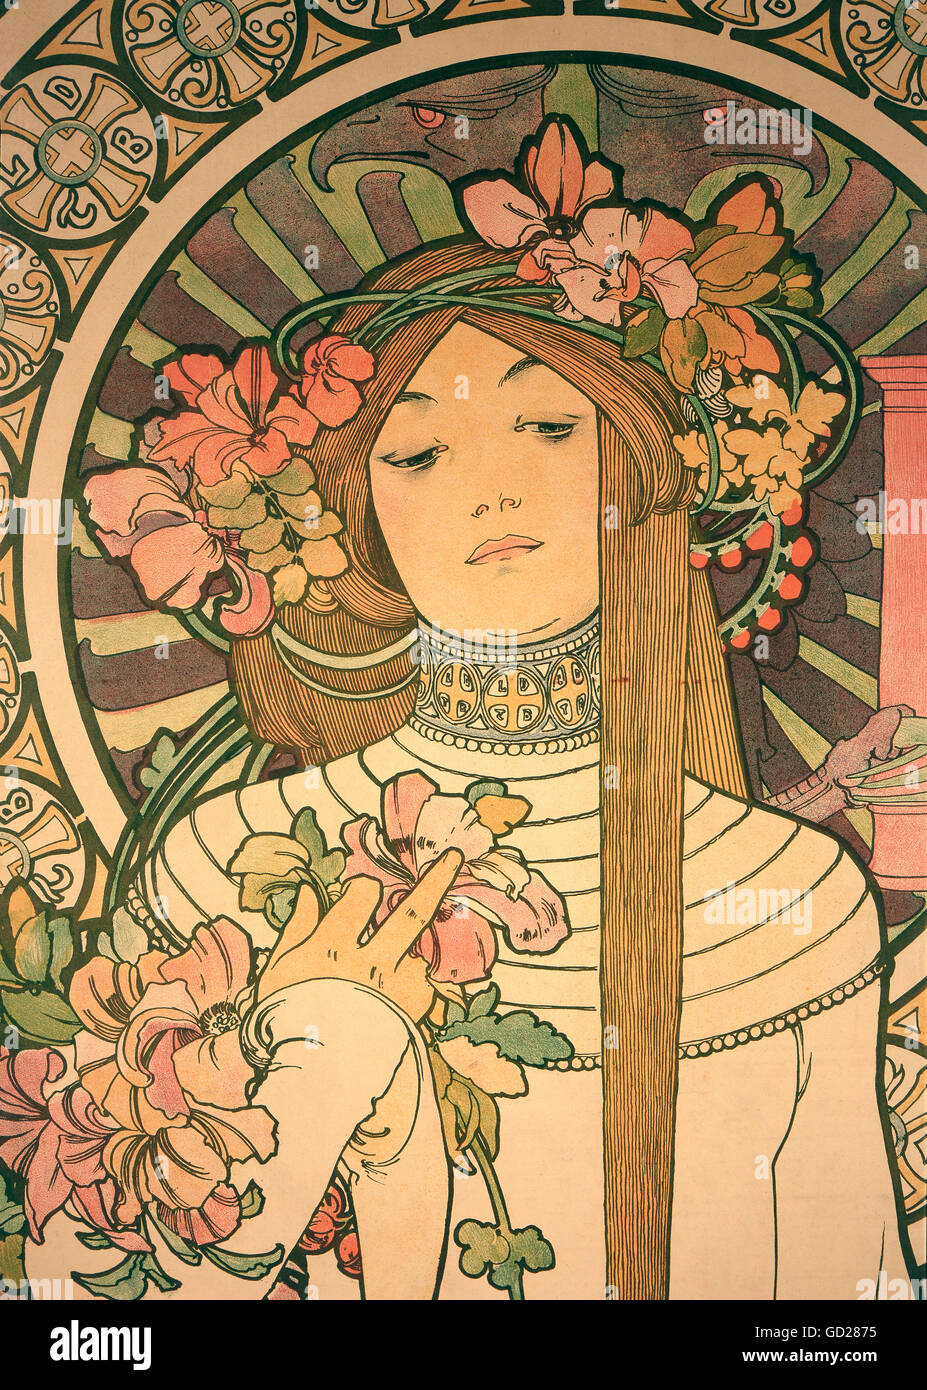 "fine arts, Mucha, Alphonse (1860 - 1939), poster, advertising poster for ""La Trappistine"" liqueur, colour lithograph, Stock Photo"